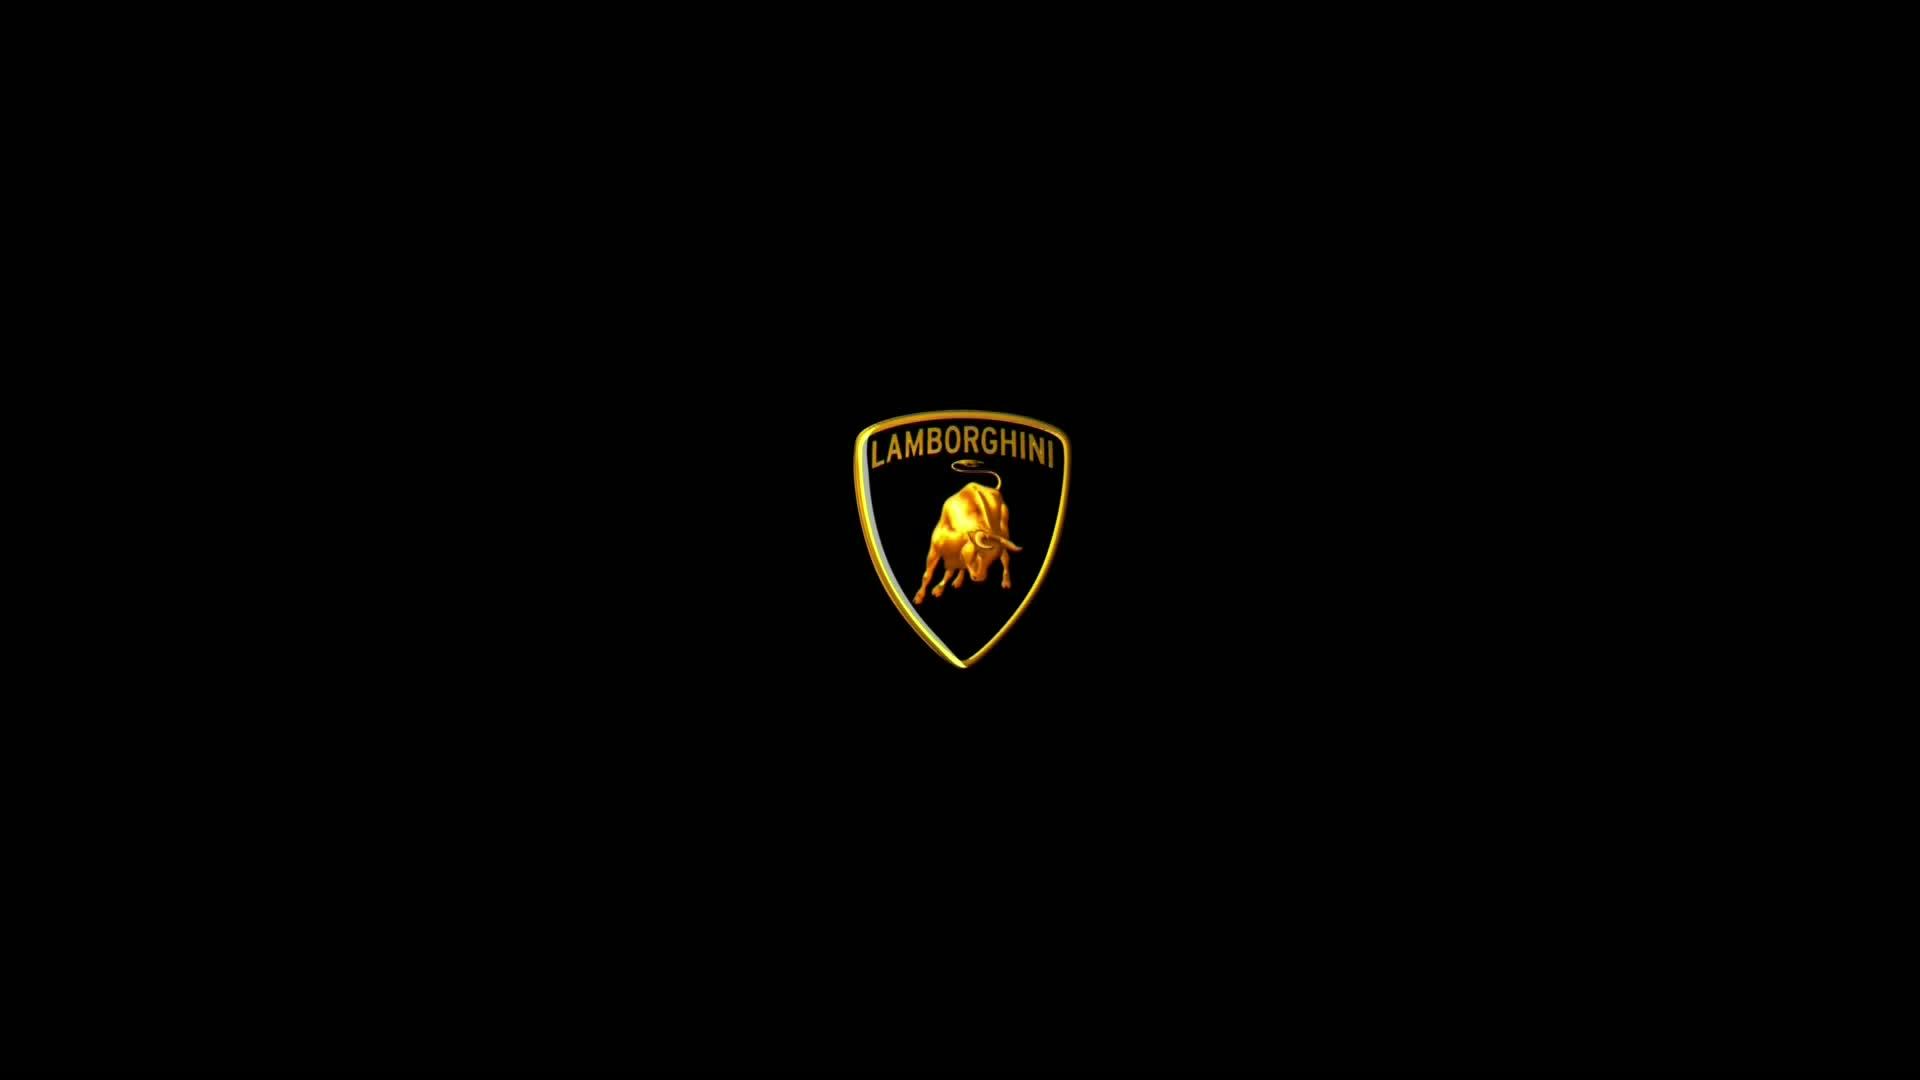 lamborghini logo 2014 wallpapers Desktop Backgrounds for HD 1920x1080